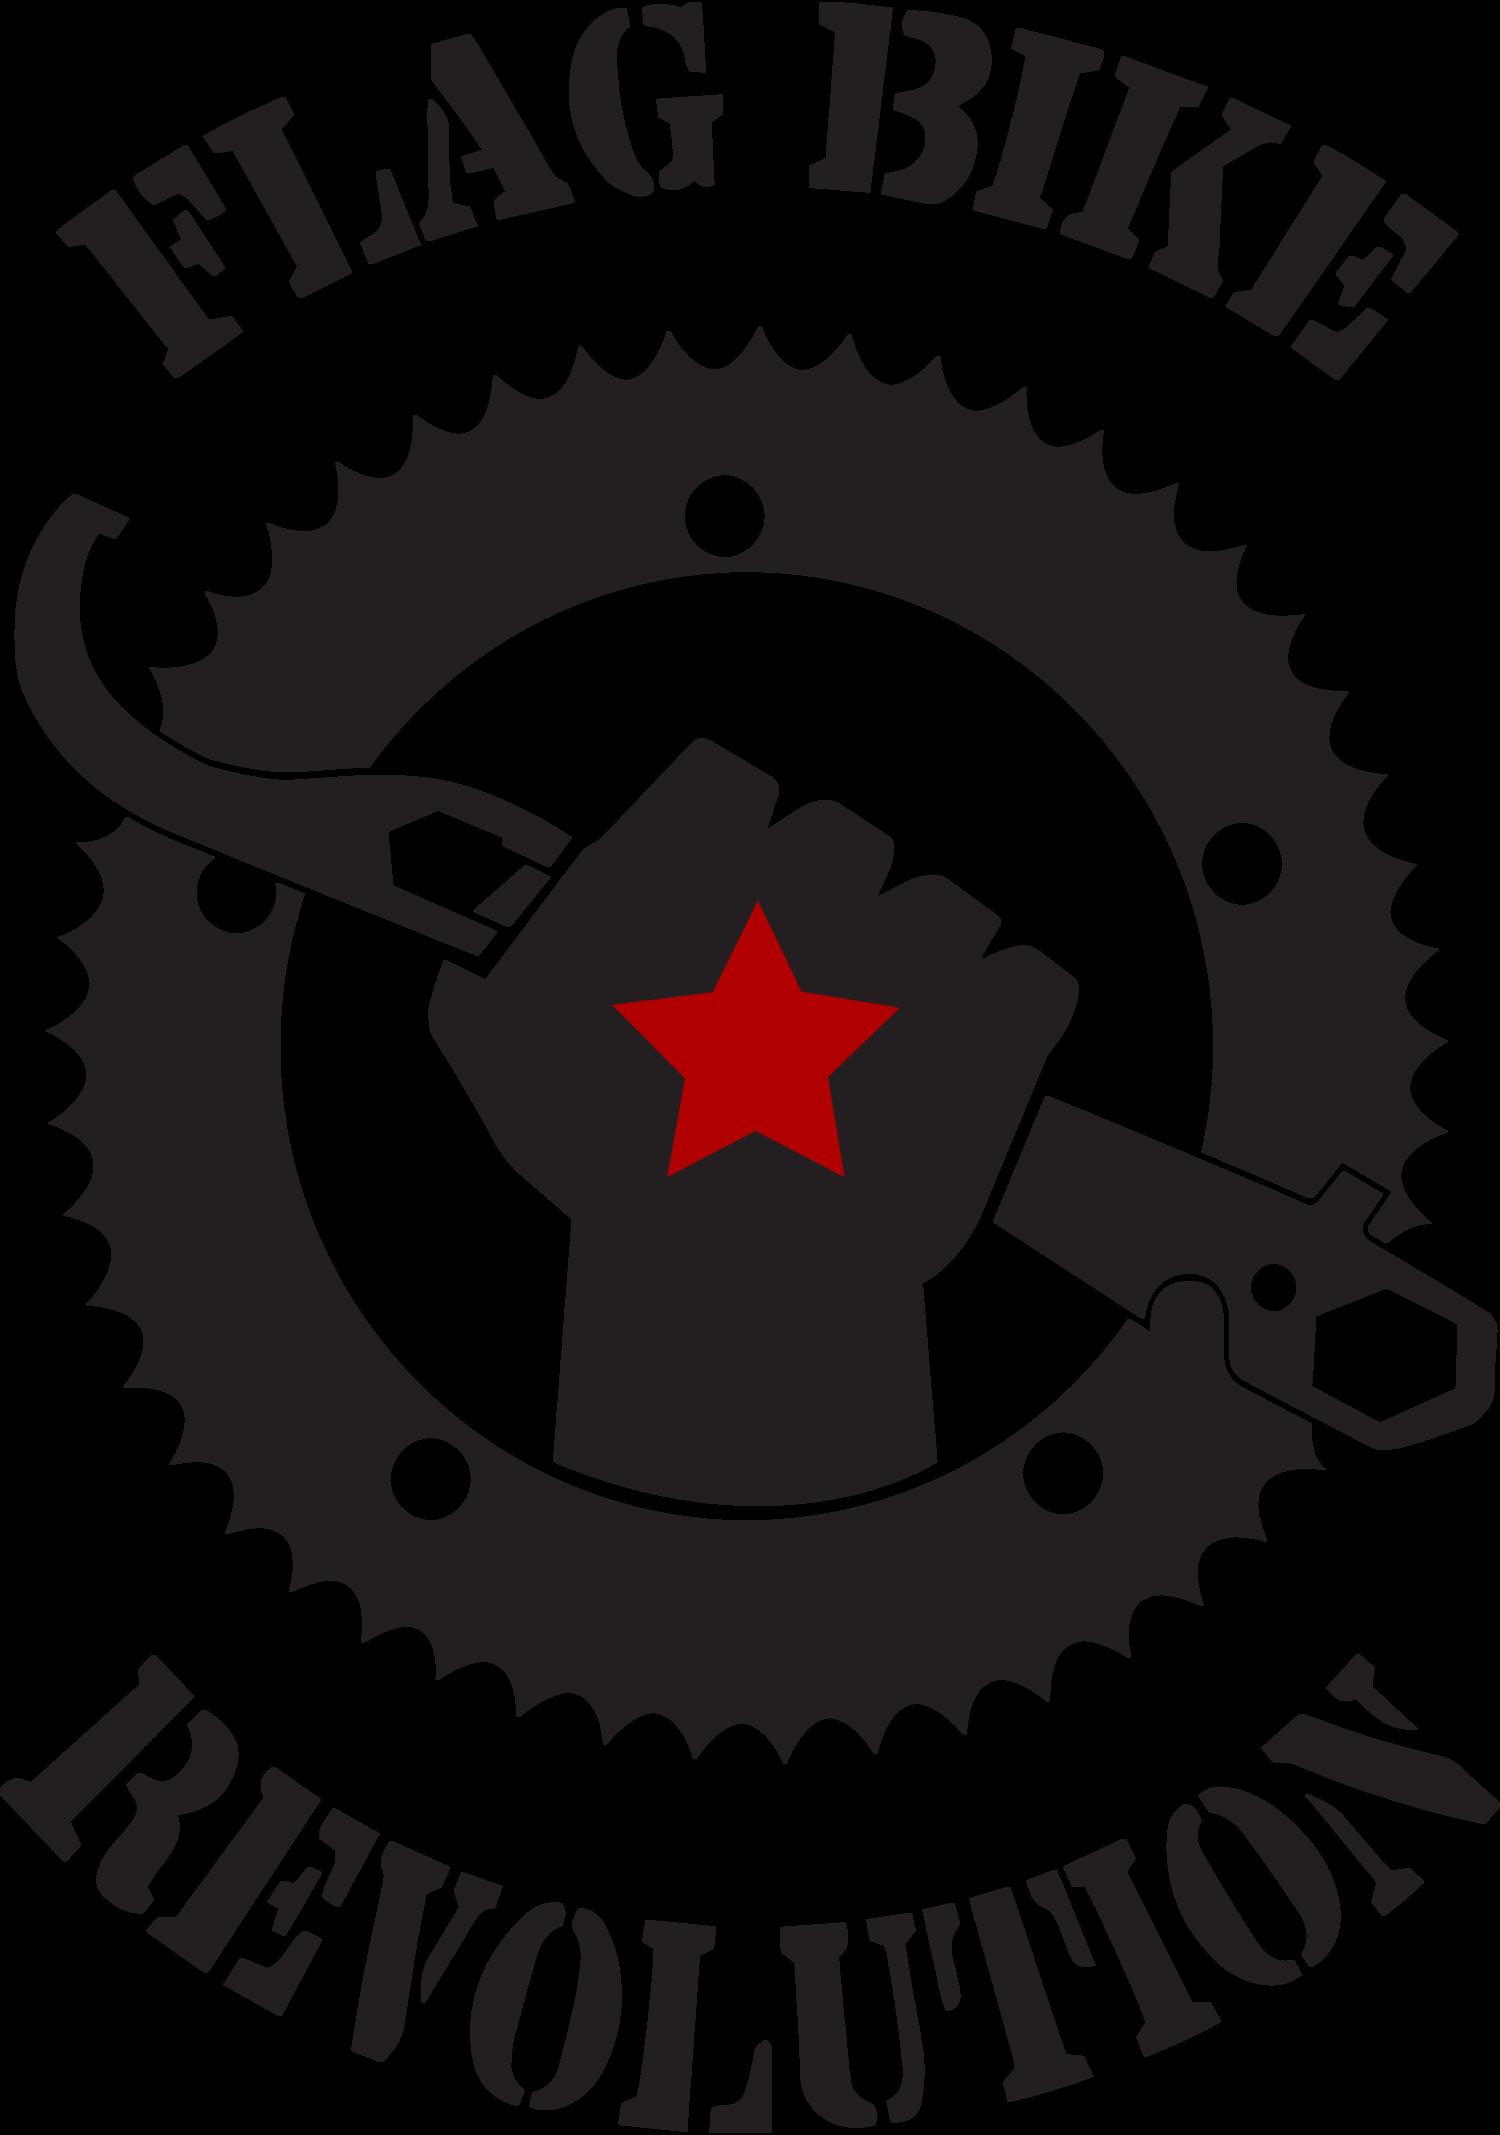 Flagstaff bike revolution . Gear clipart gear frame